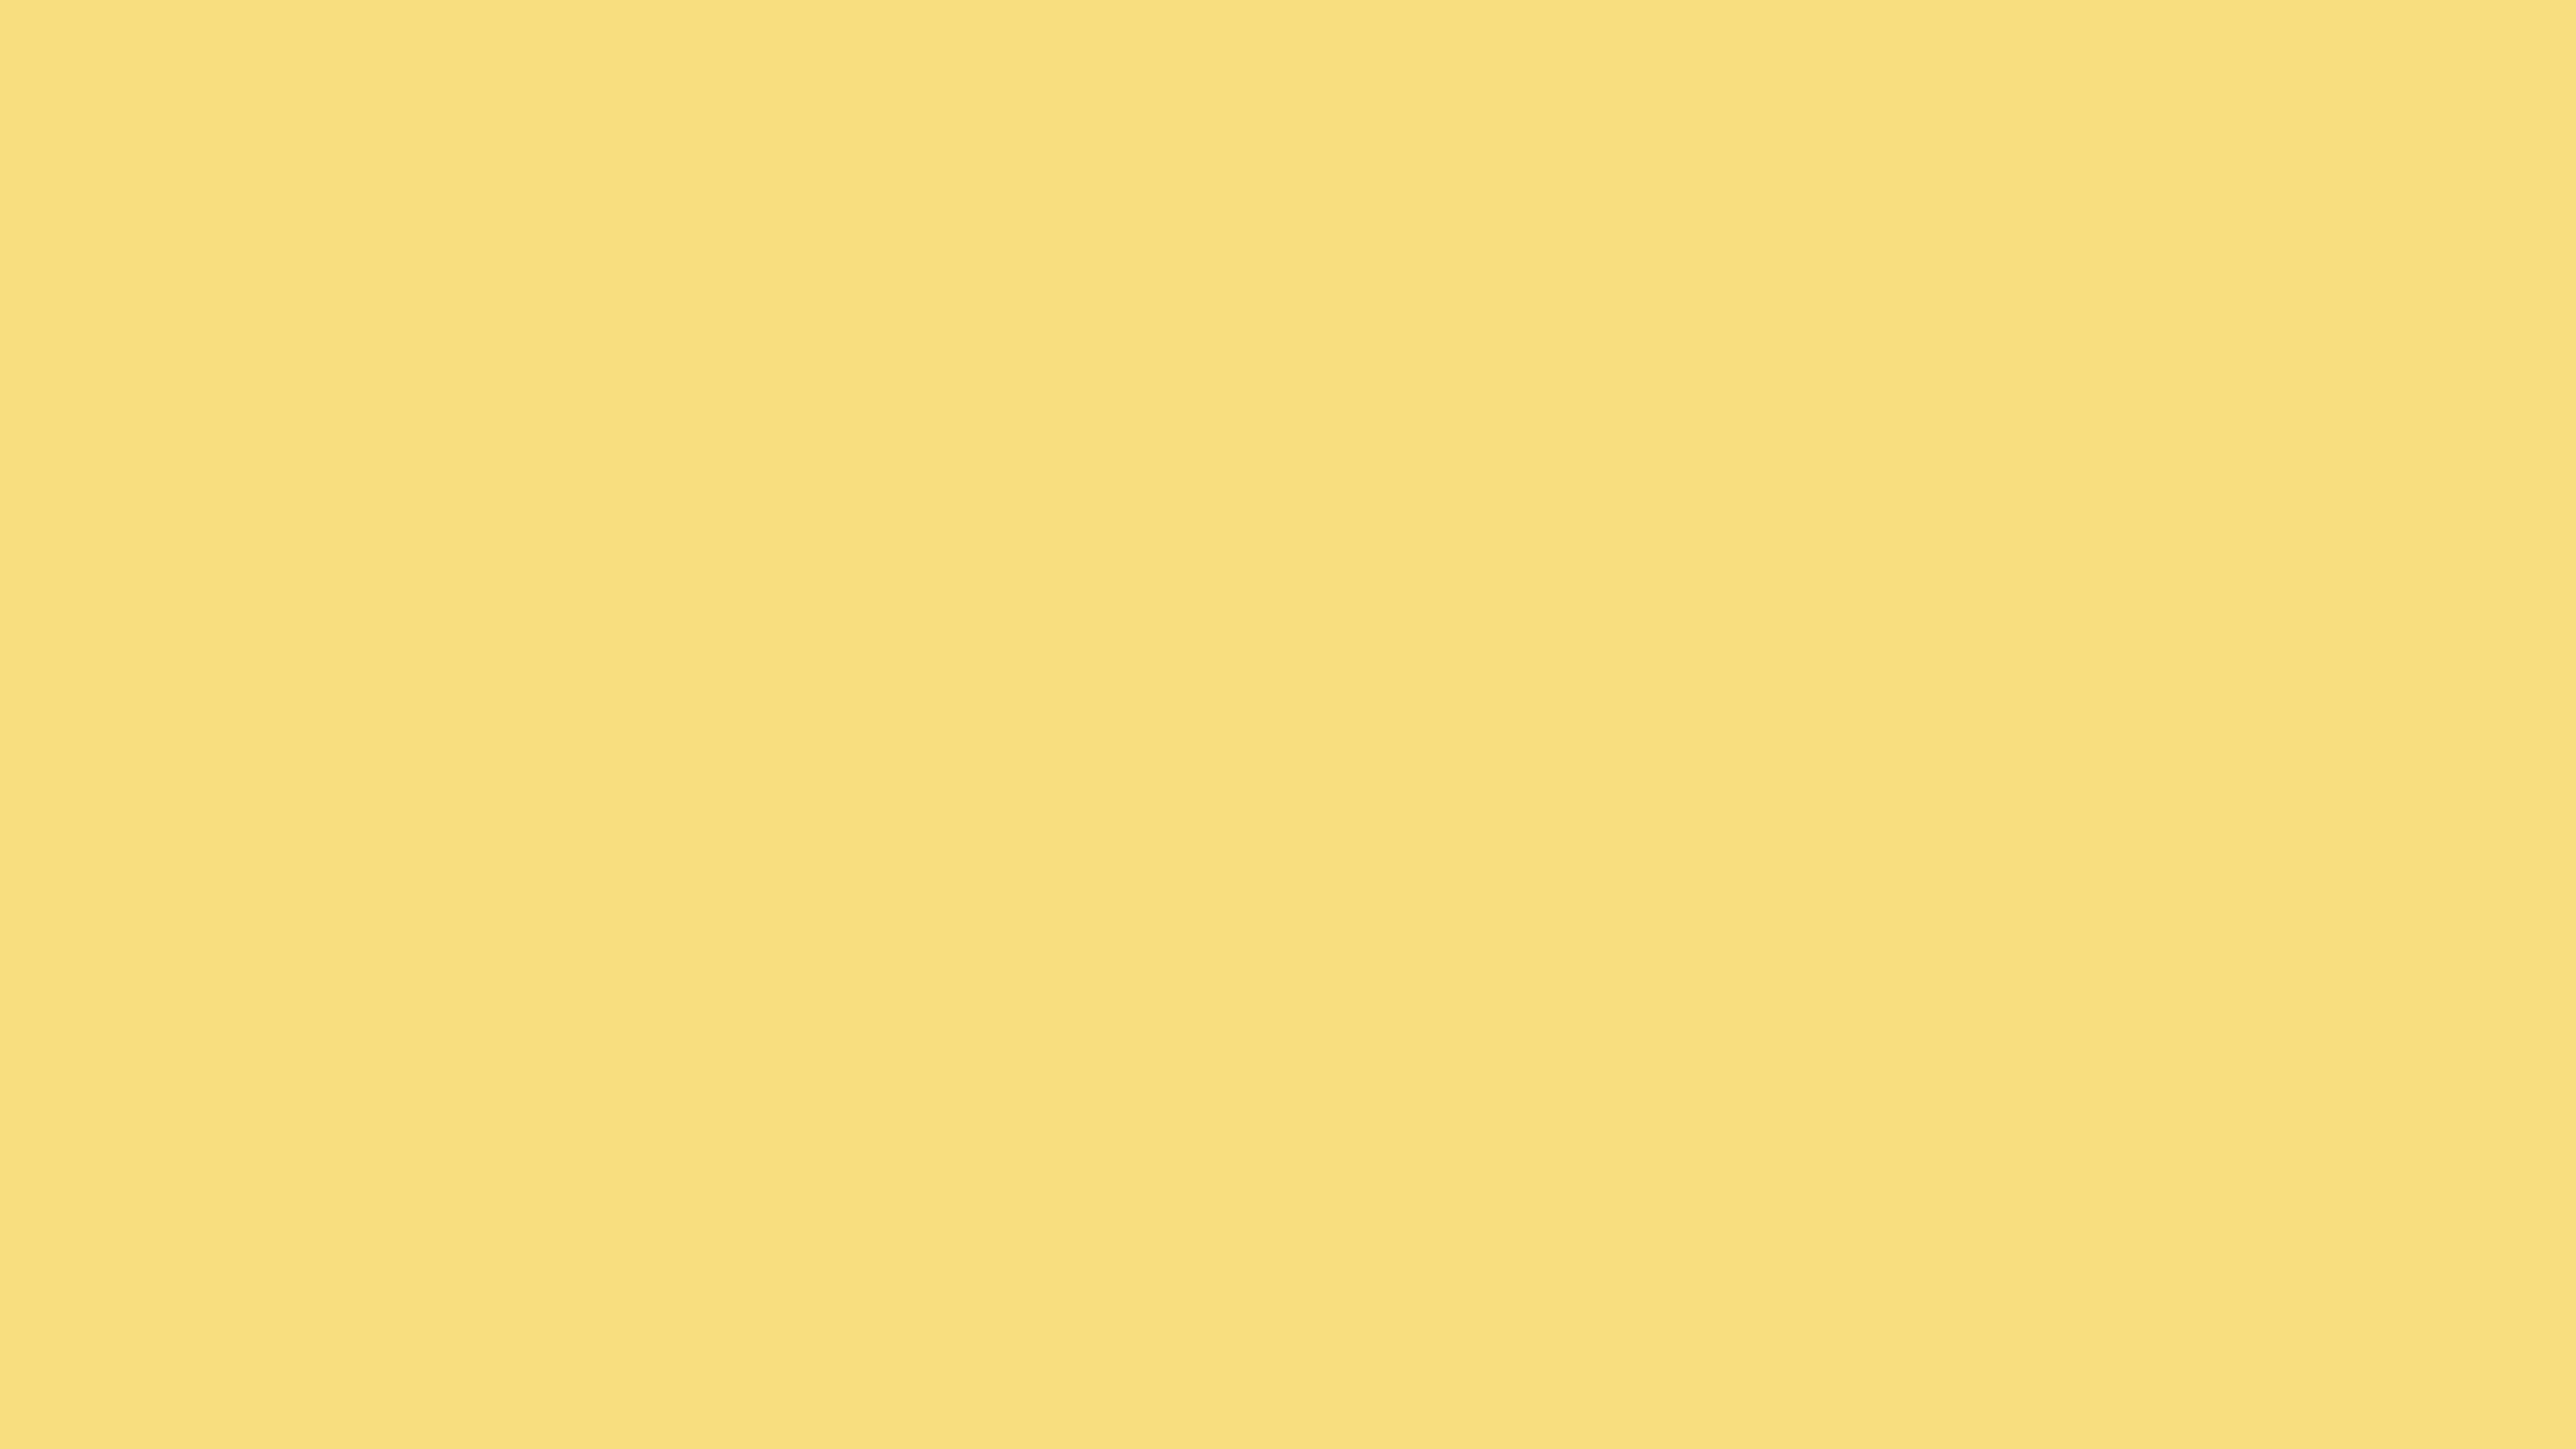 Jasmine Solid Color Background Wallpaper [5120x2880]